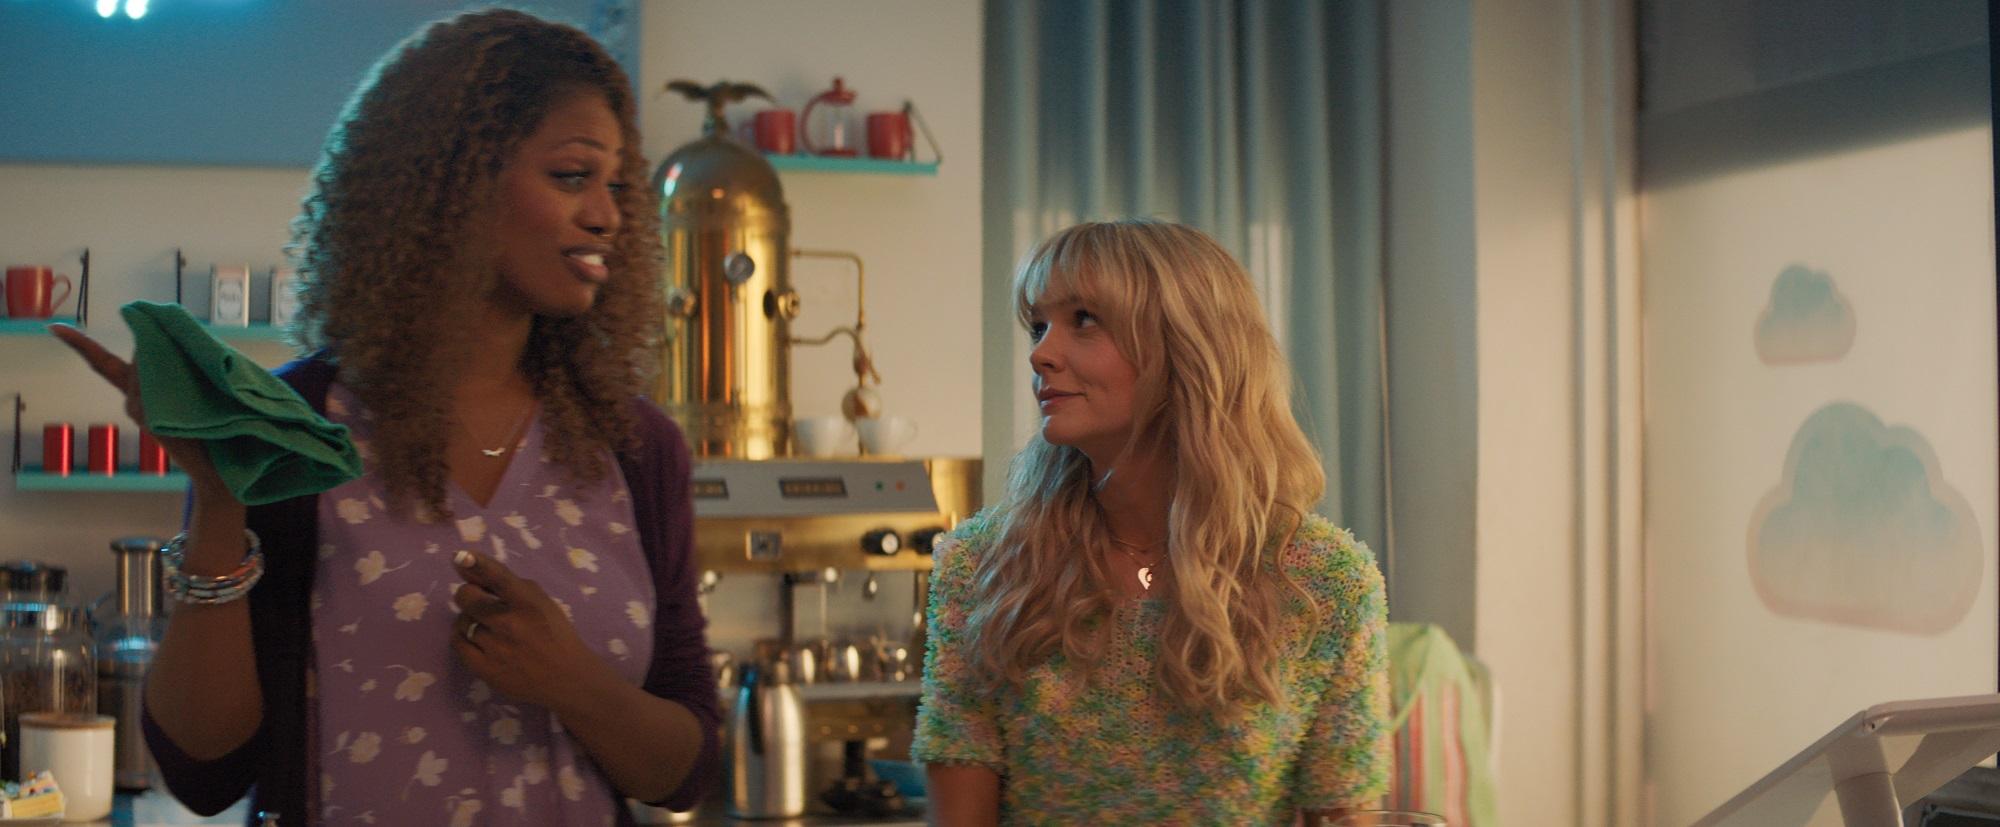 Laverne Cox and Carey Mulligan in Croatia with Love (2020)